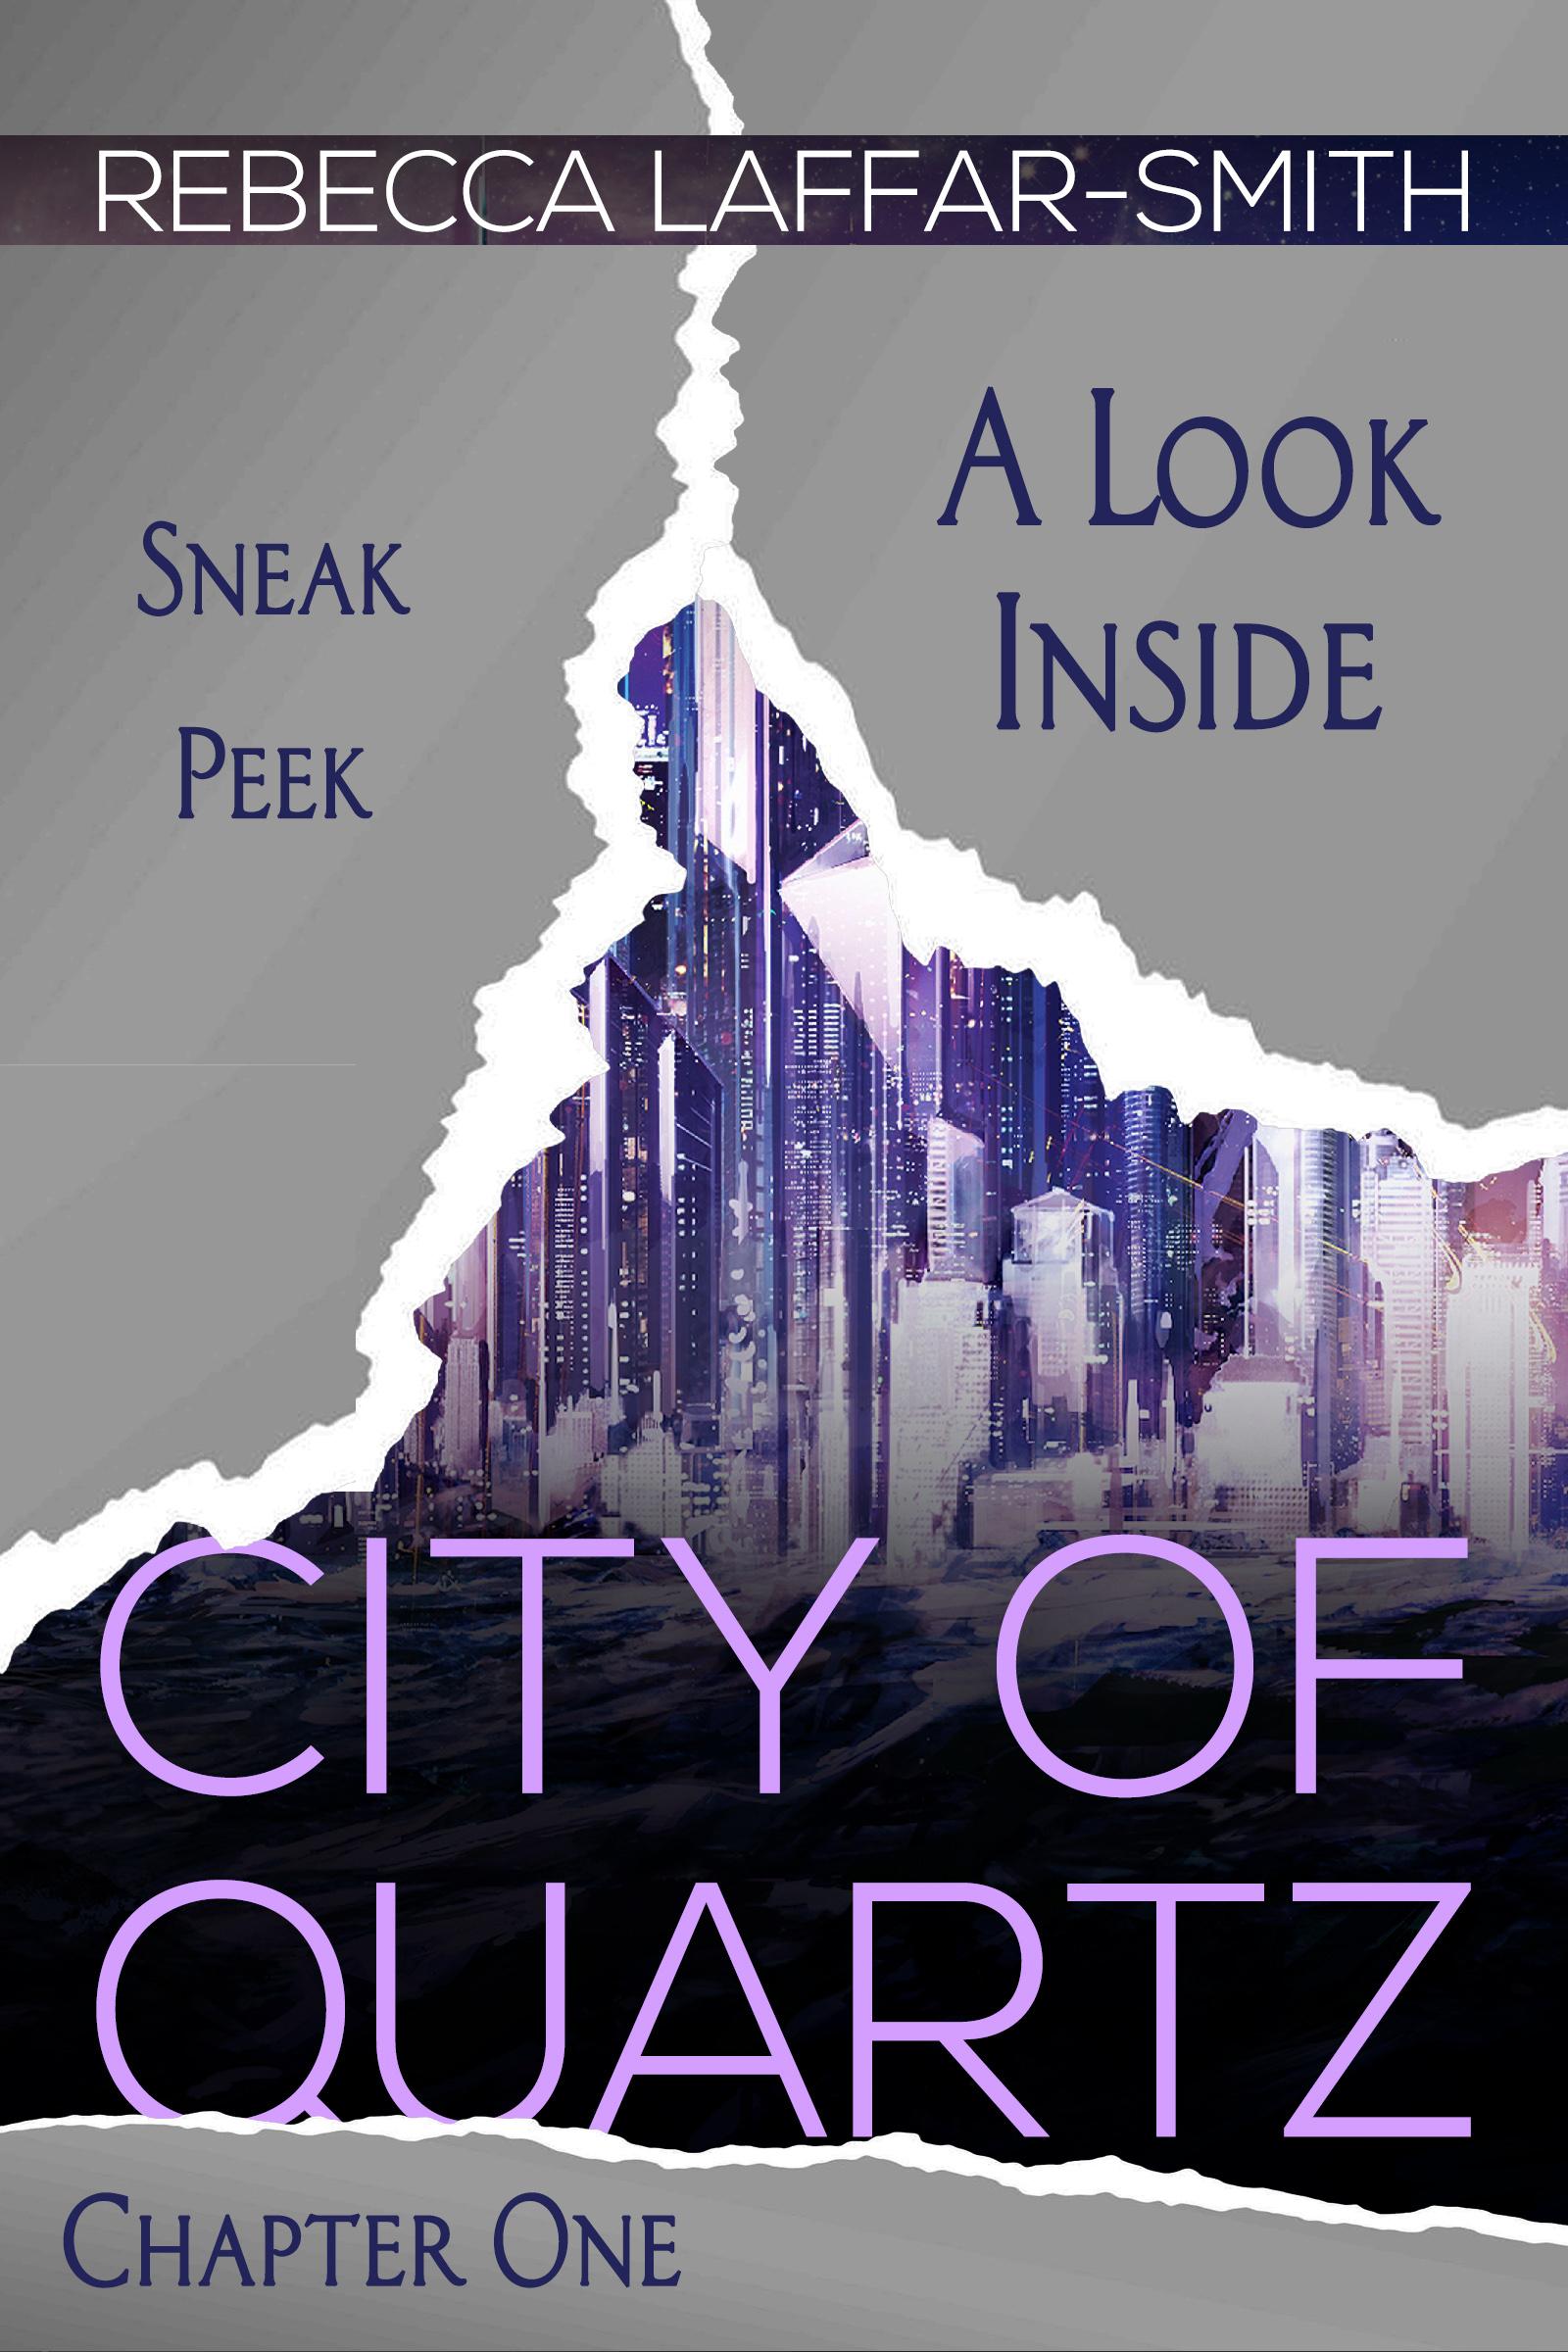 City of Quartz - Cover Reveal [Sneak Peek]